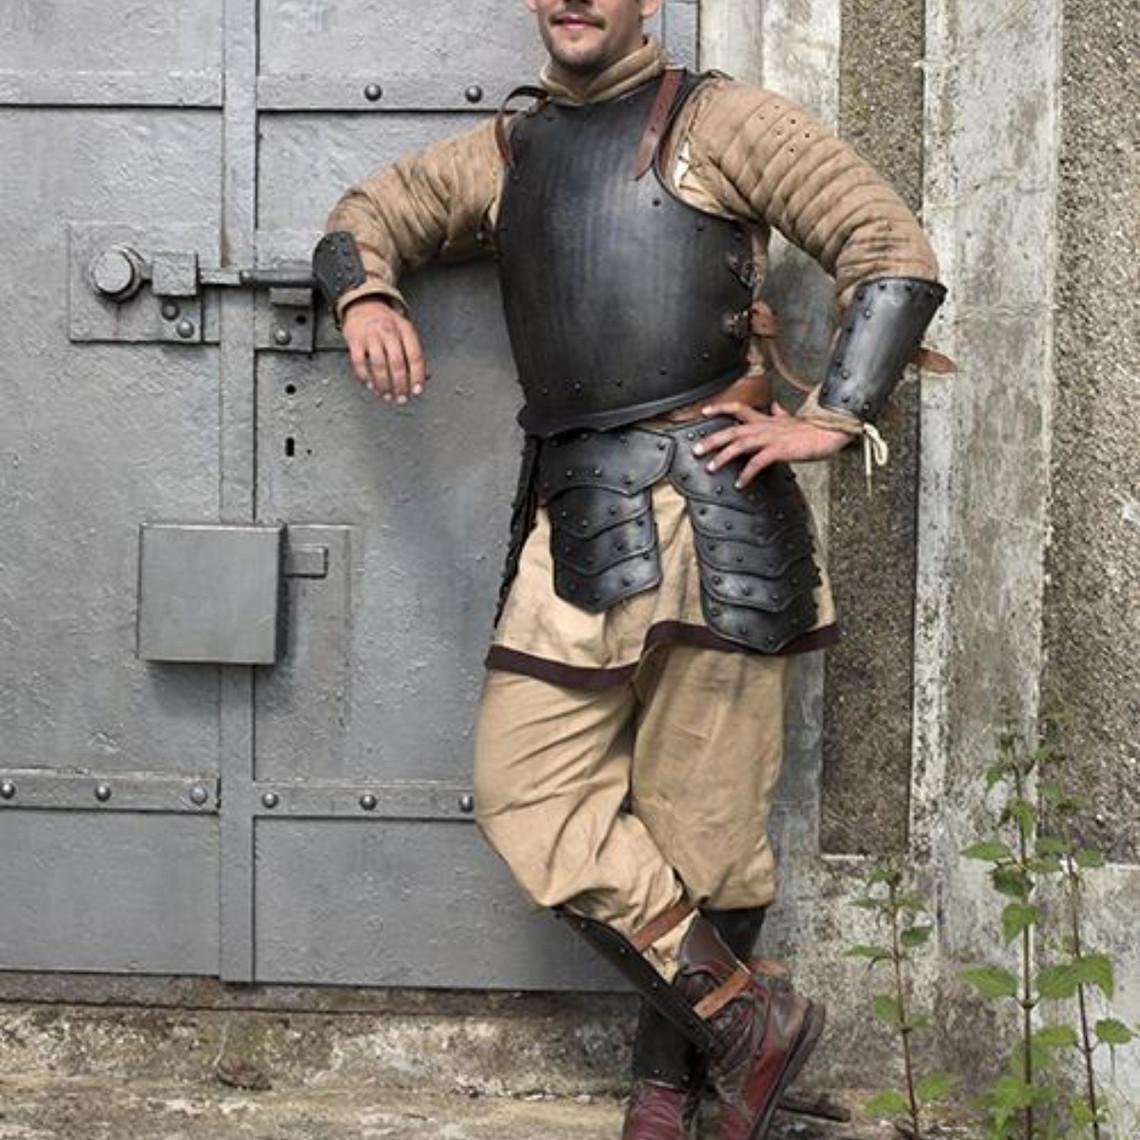 Epic Armoury Cuna medieval con remaches patinados.